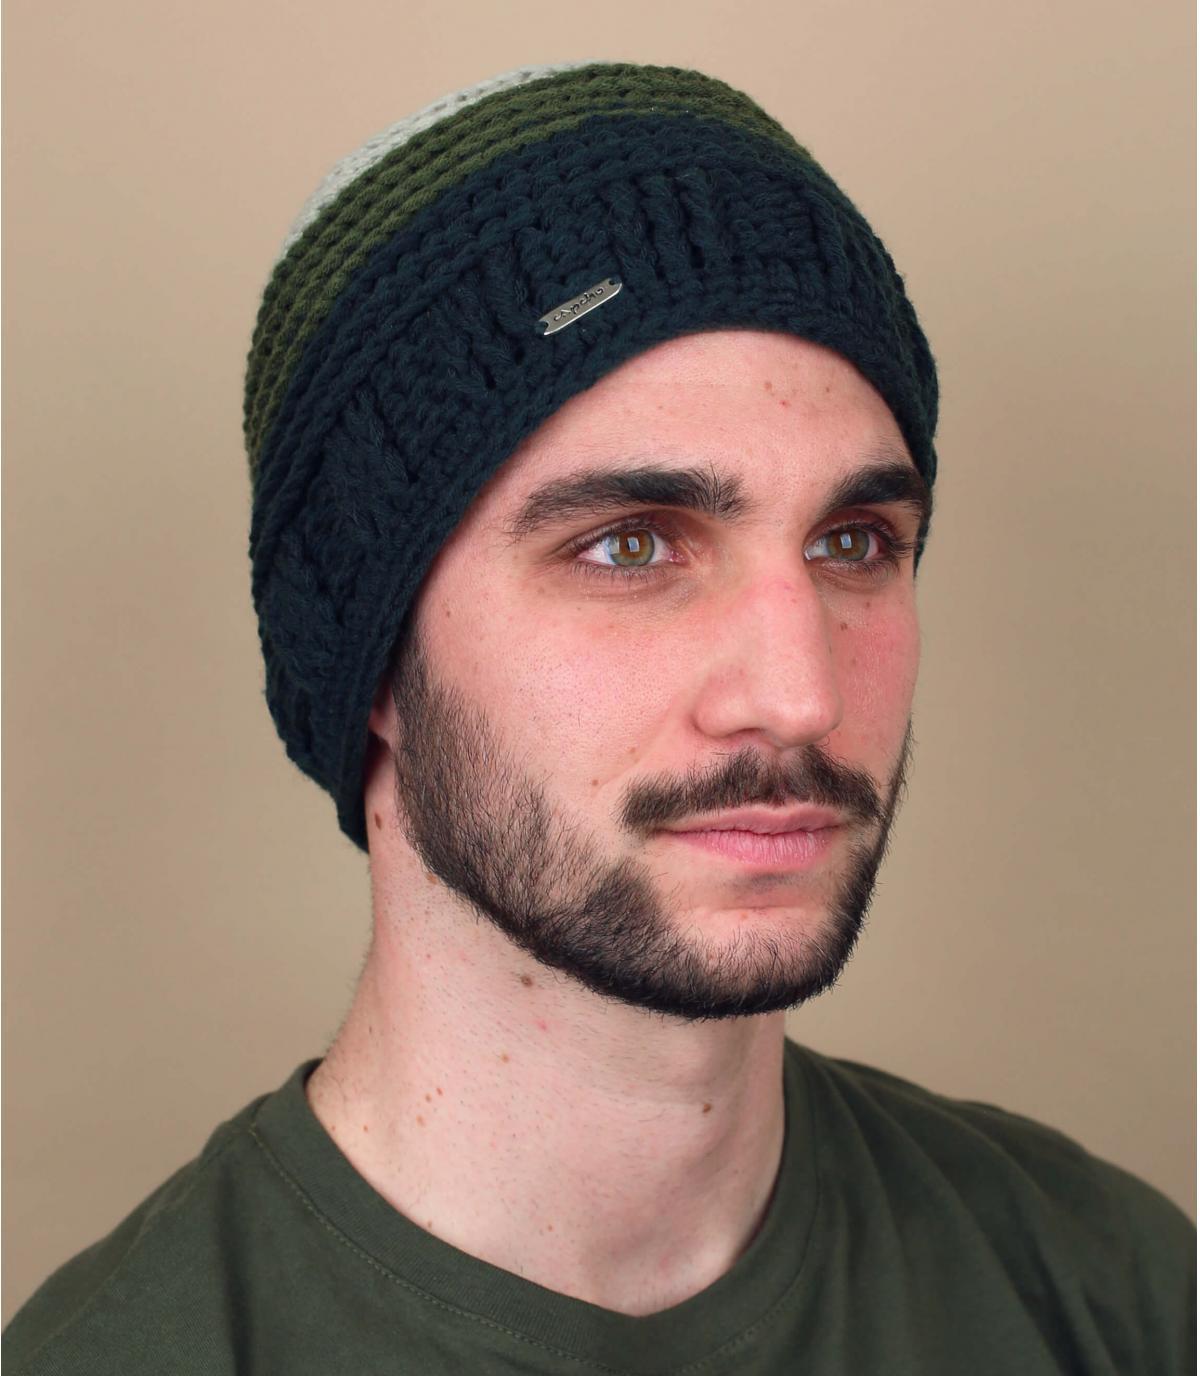 Mütze grün abgestuft